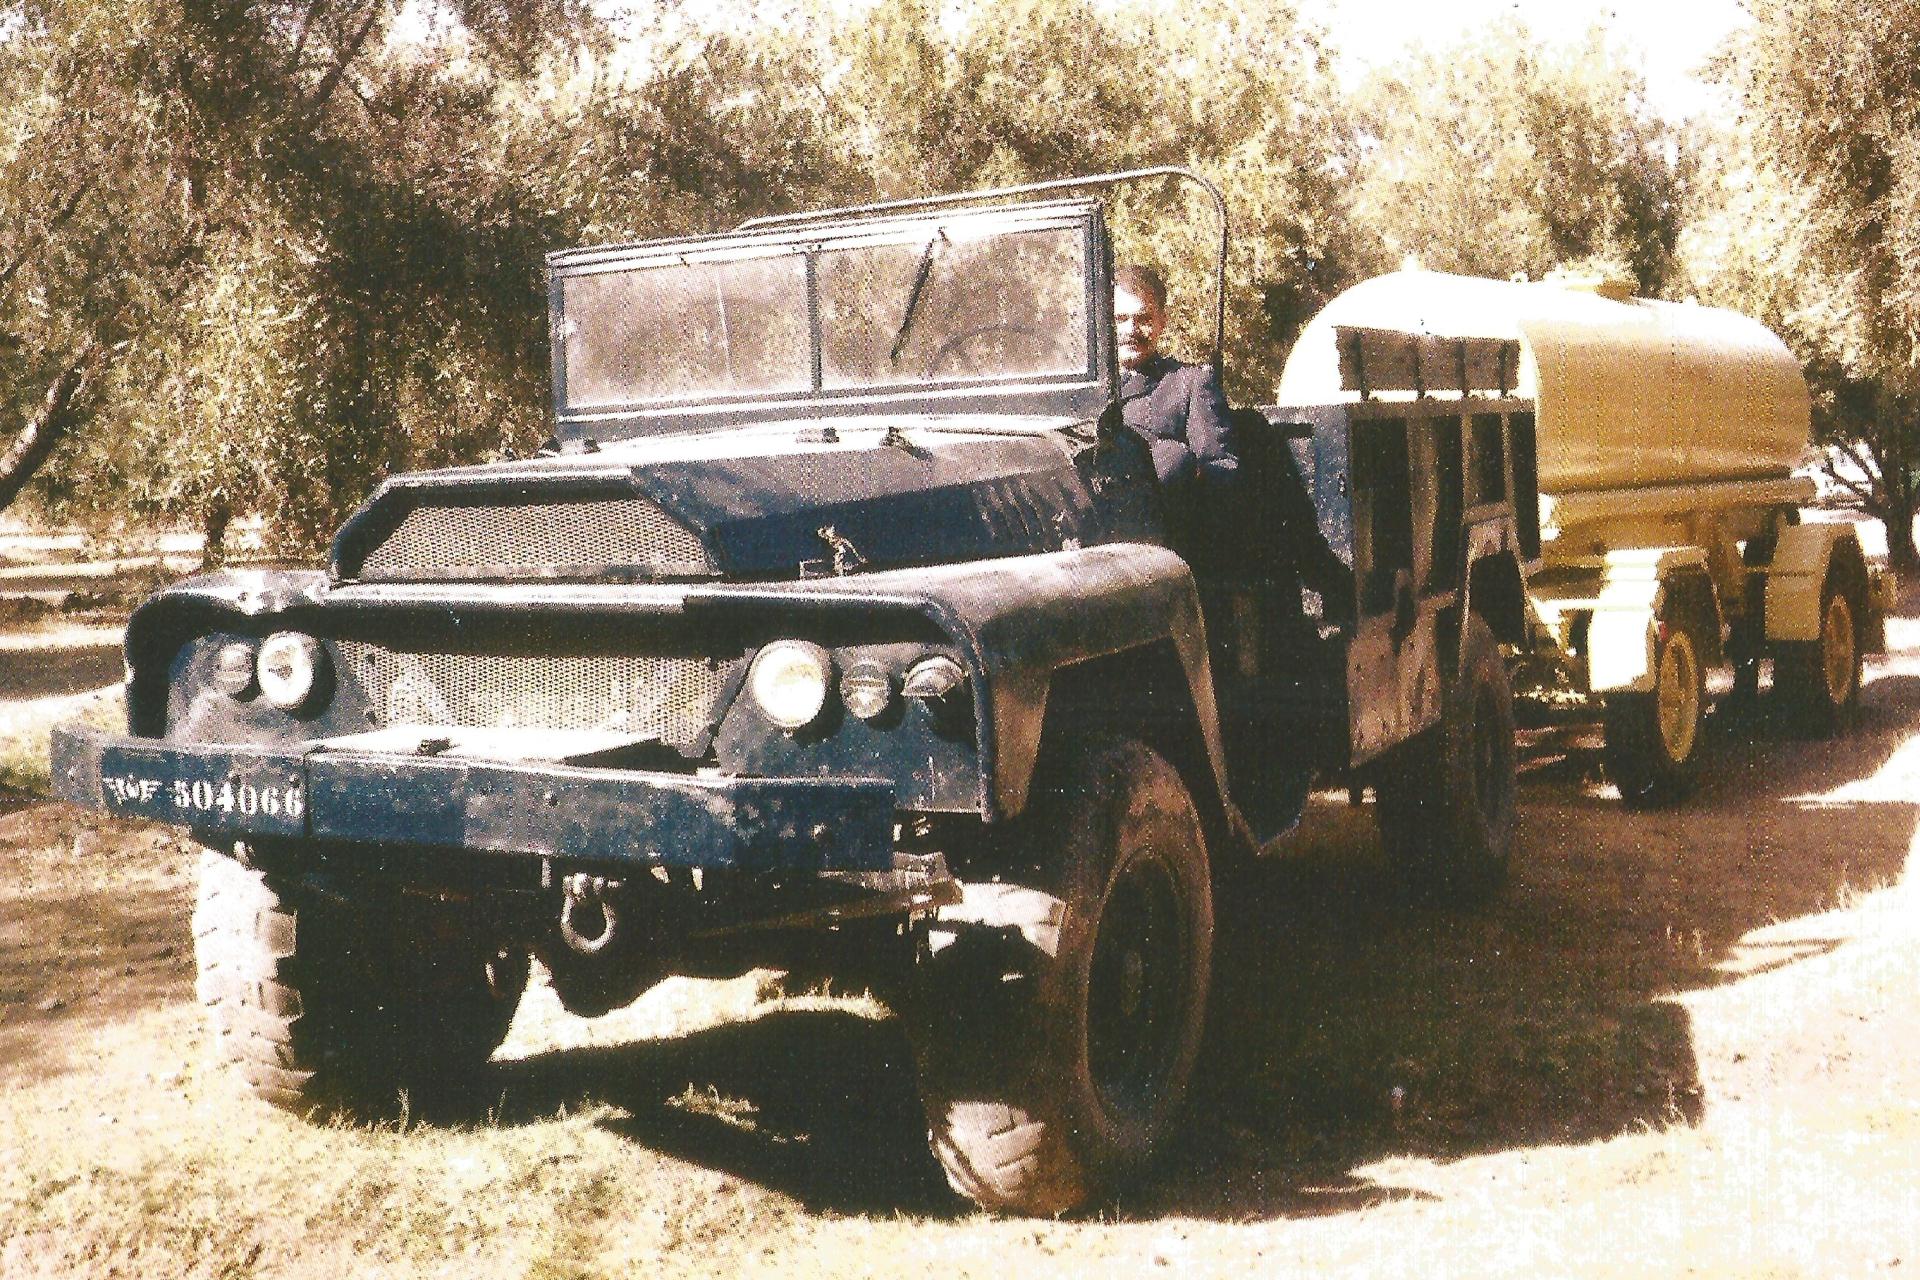 Transport Routier au Maroc - Histoire - Page 2 40793198091_876d1fab5f_o